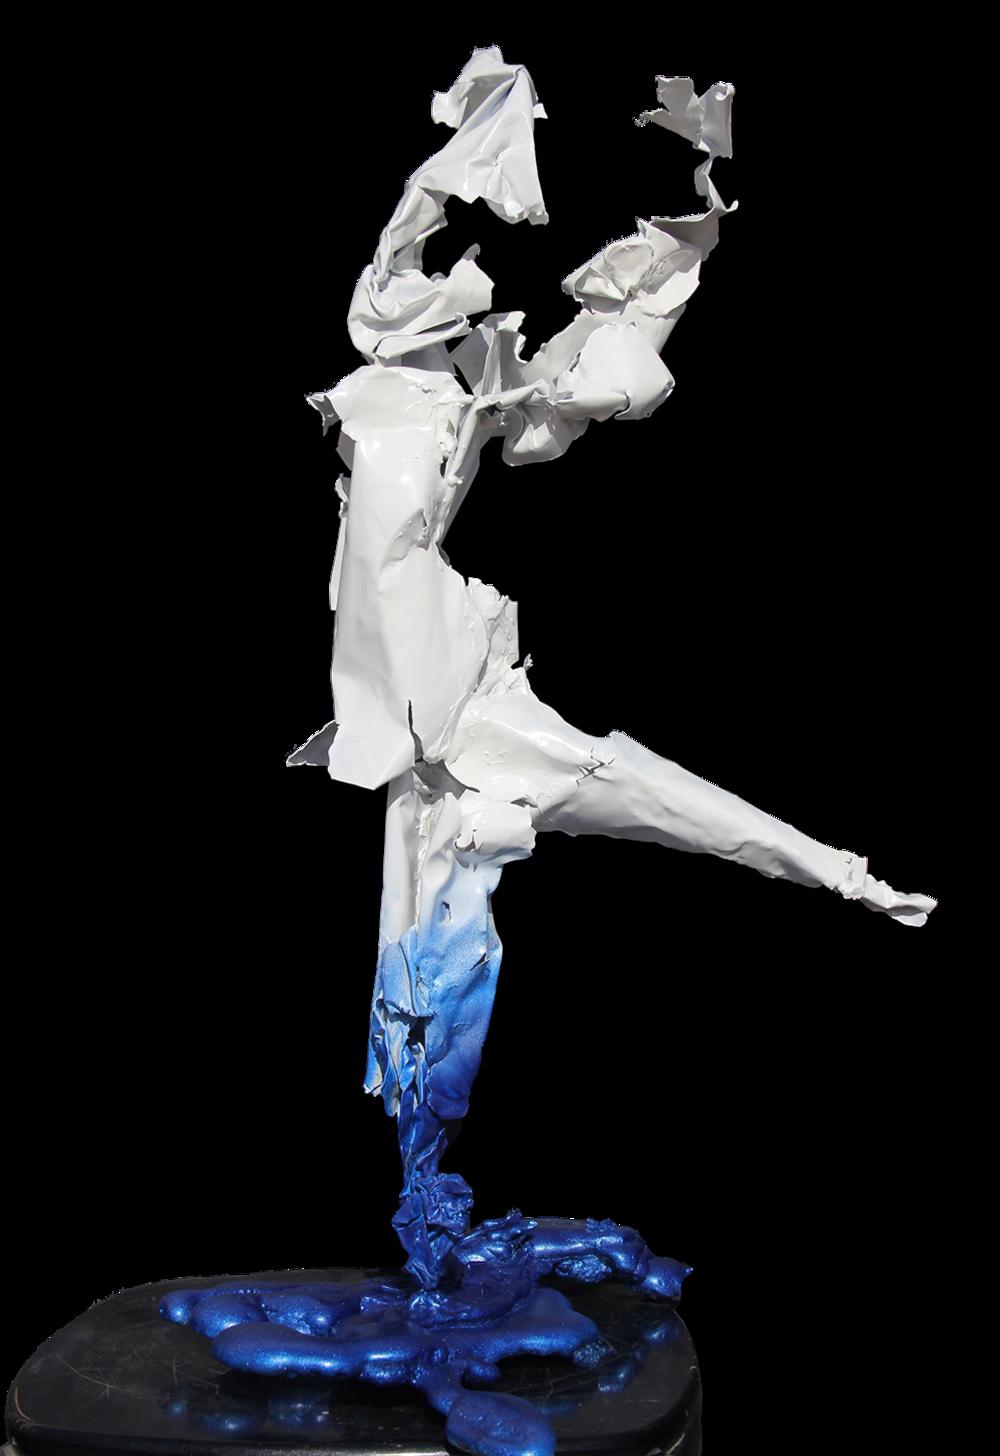 Dance, Ballerina, Dance